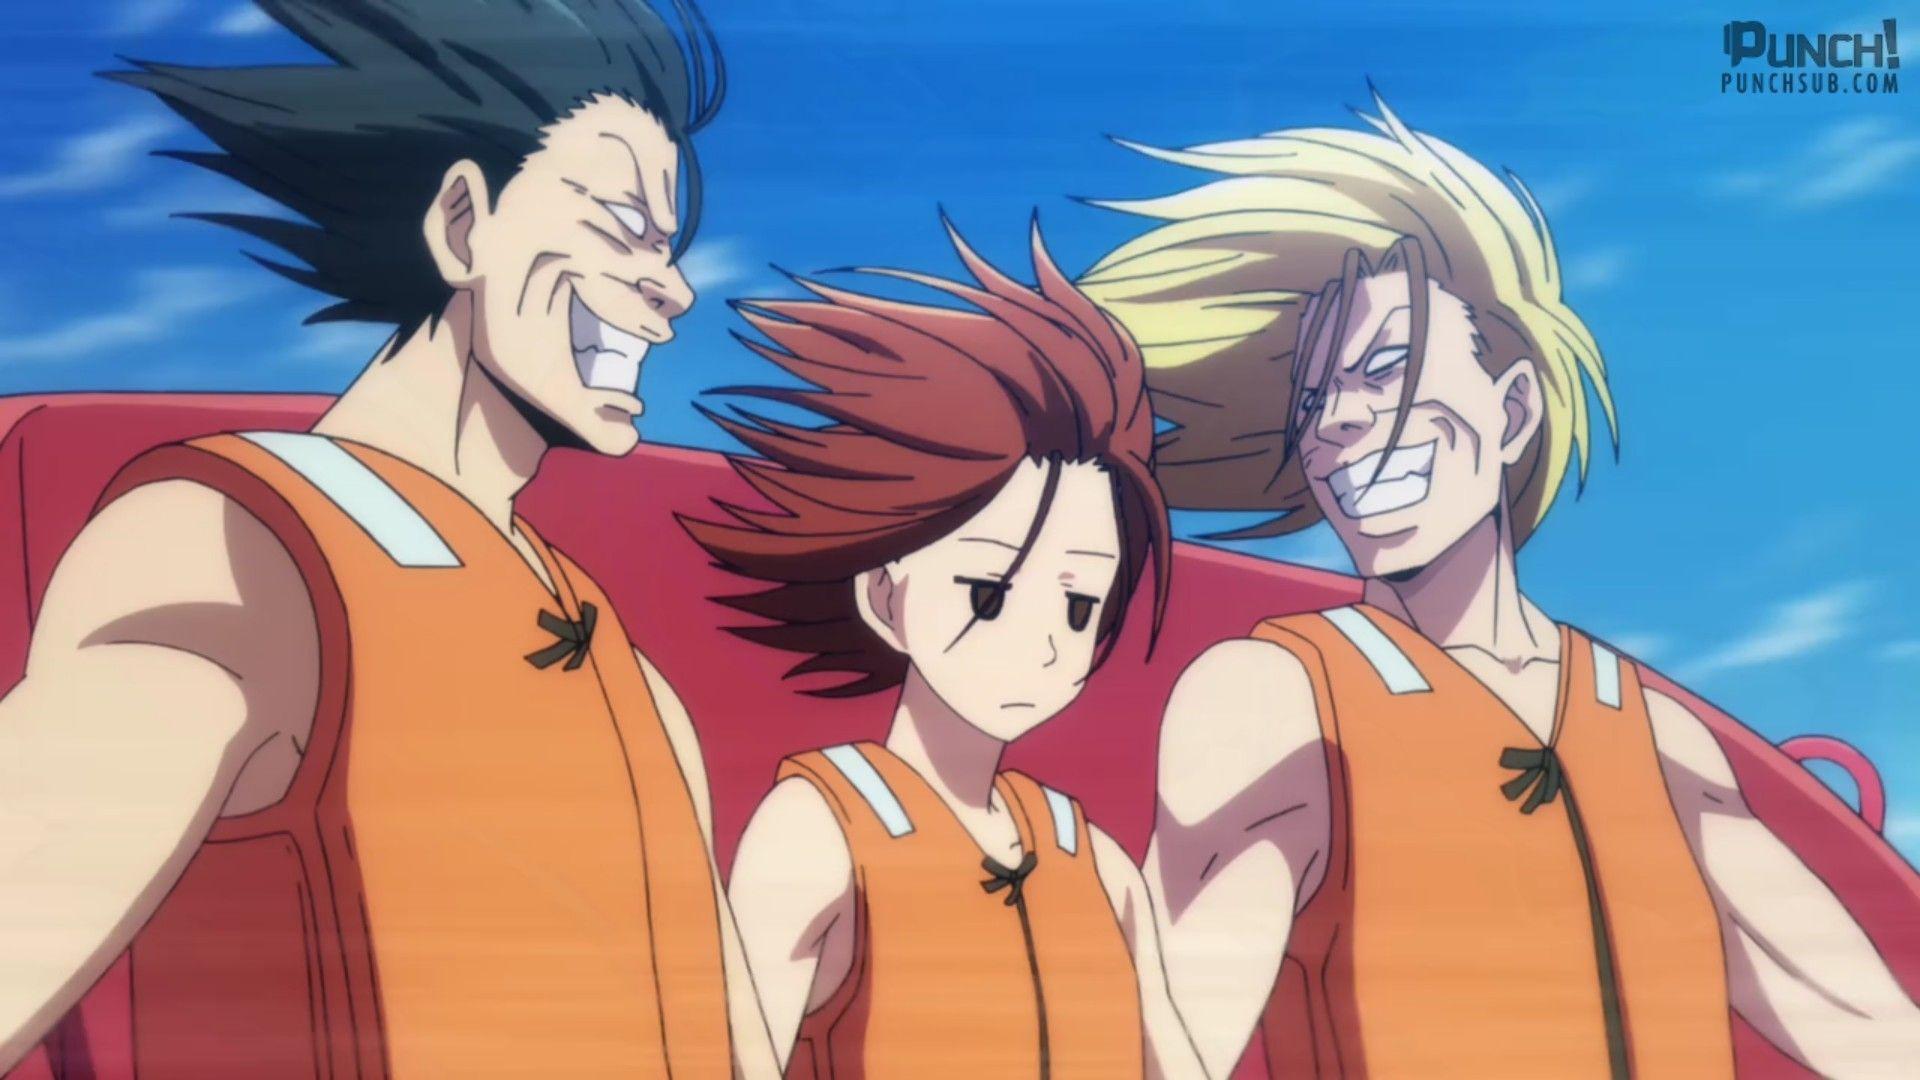 Pin By E E A E On ぐらんぶる Blue Anime Anime Draw The Squad